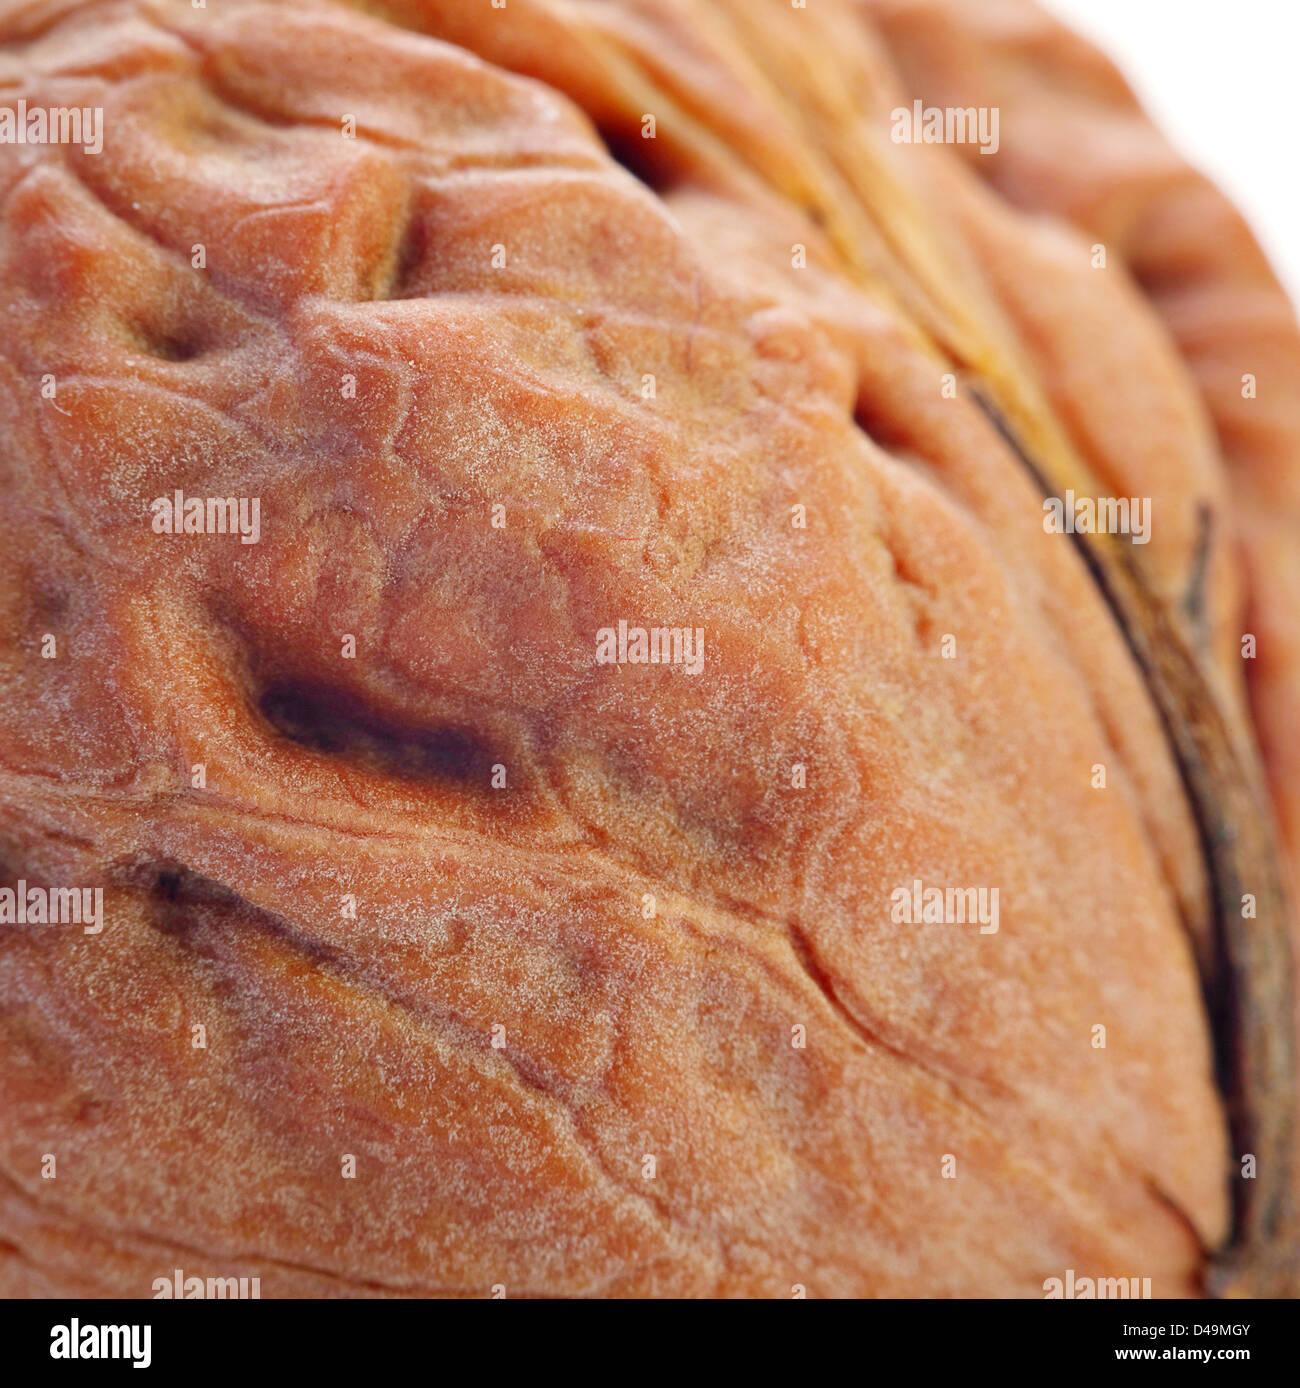 Giant walnut macro view - Stock Image